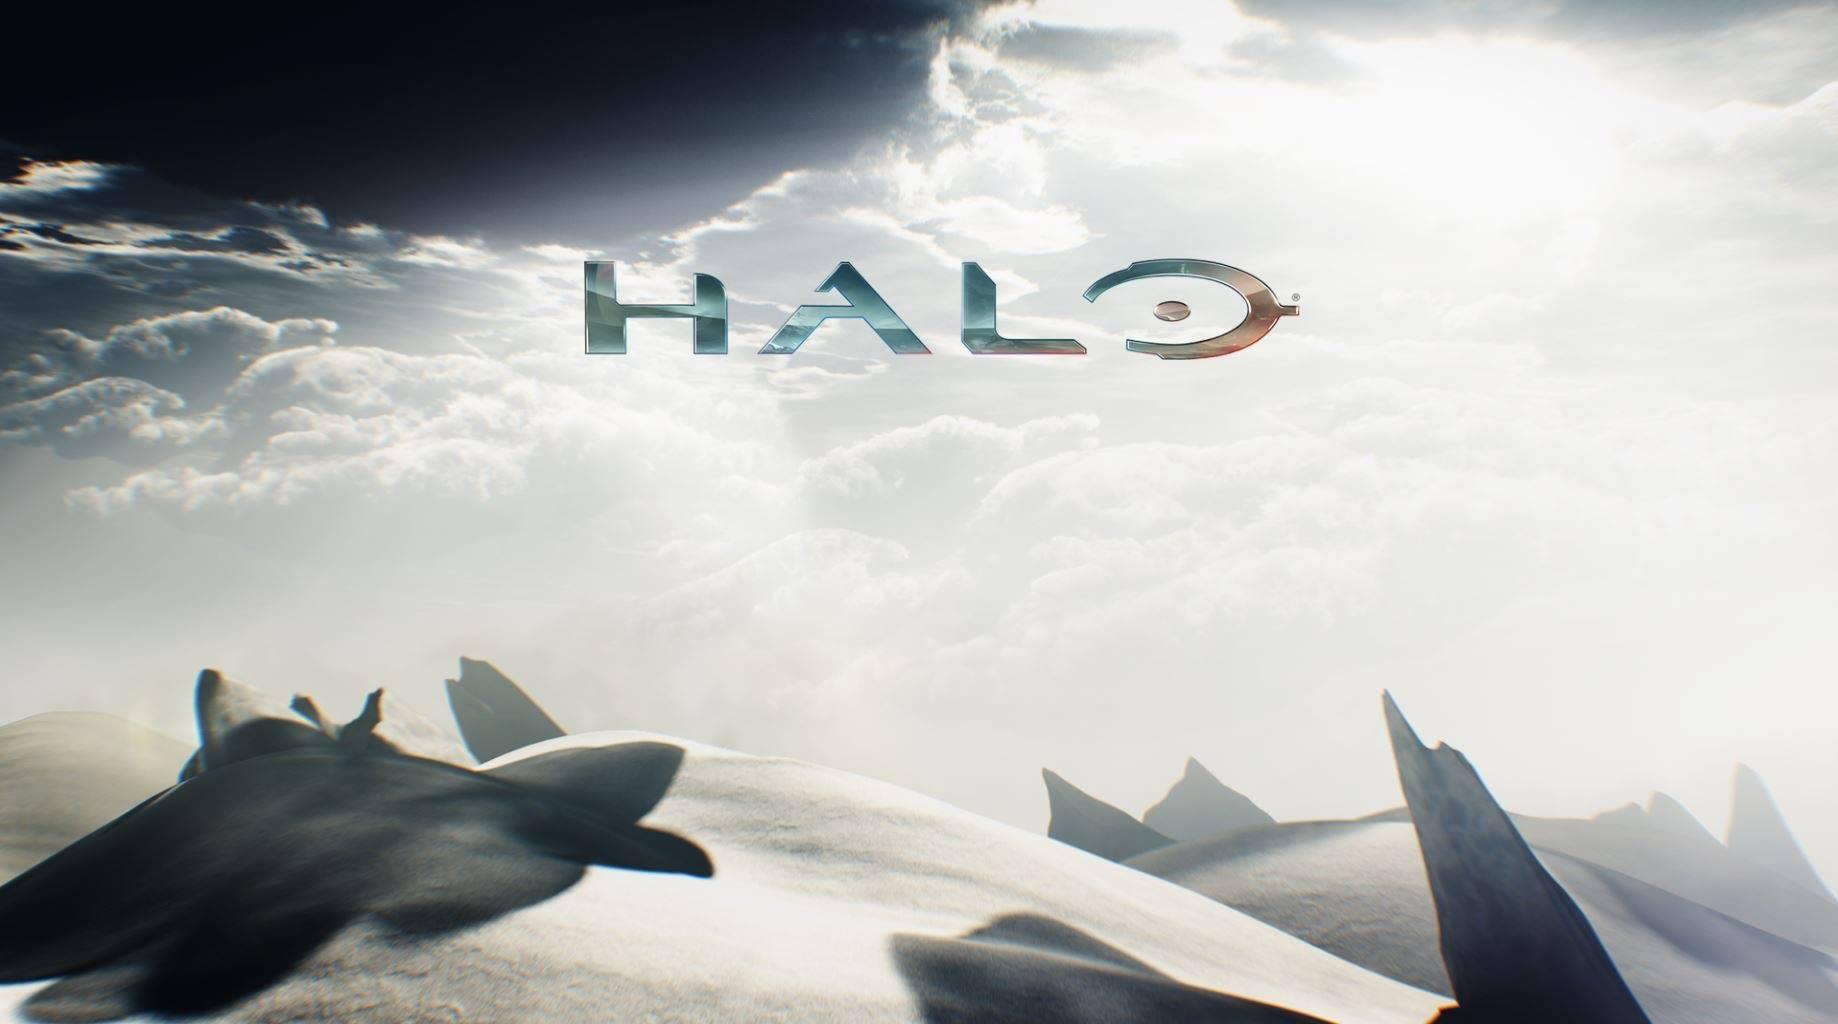 Halo 5 Guardians wallpaper 5